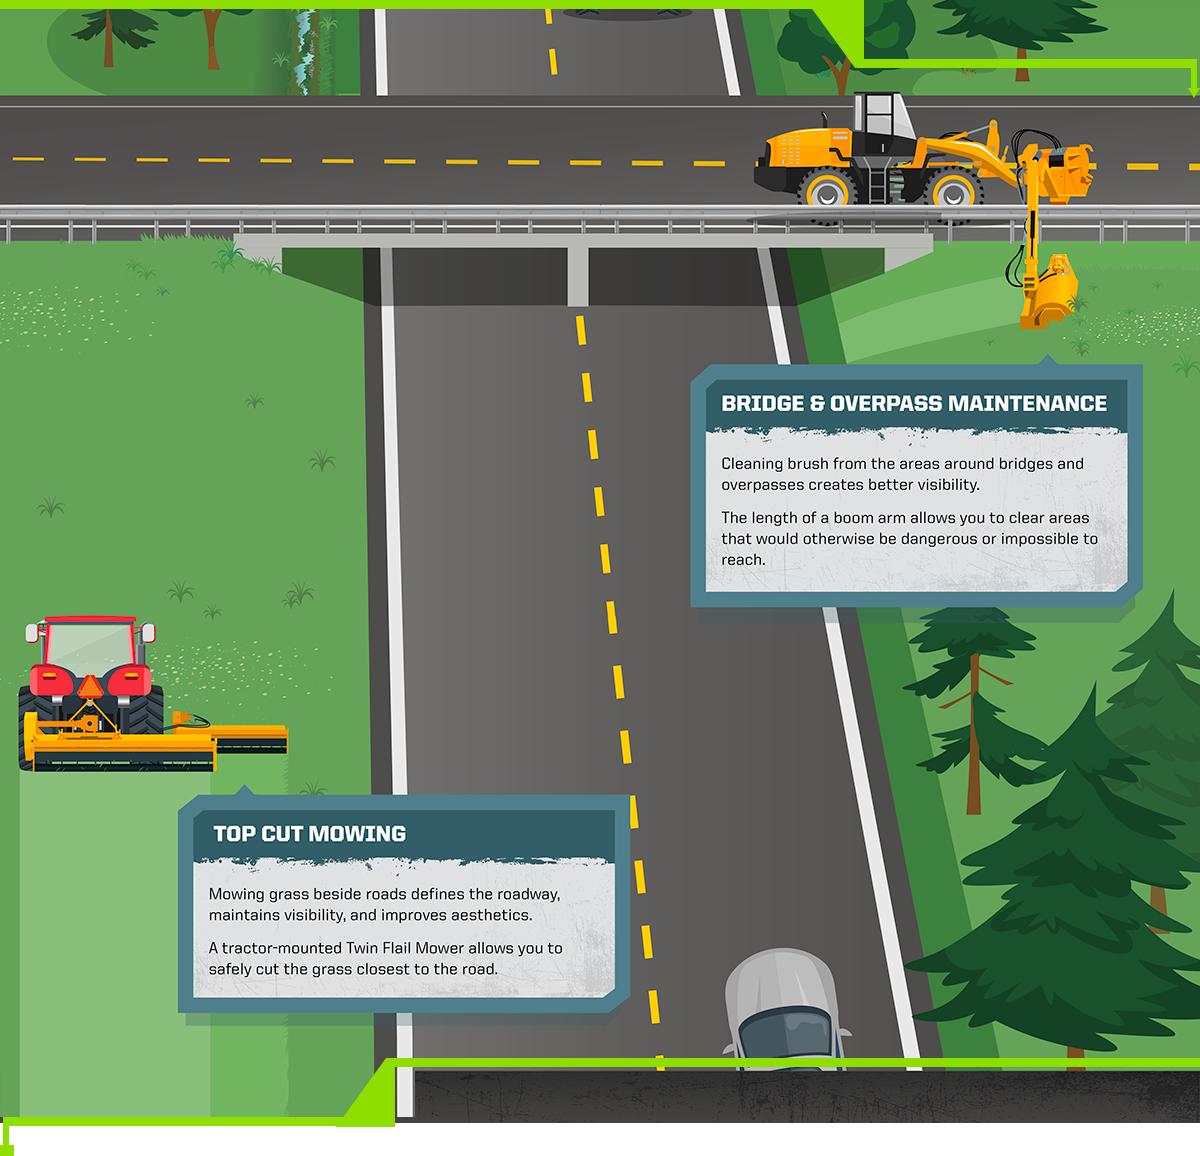 DiamondMowers_RoadsideMaint_Overpass_TopCutMowing